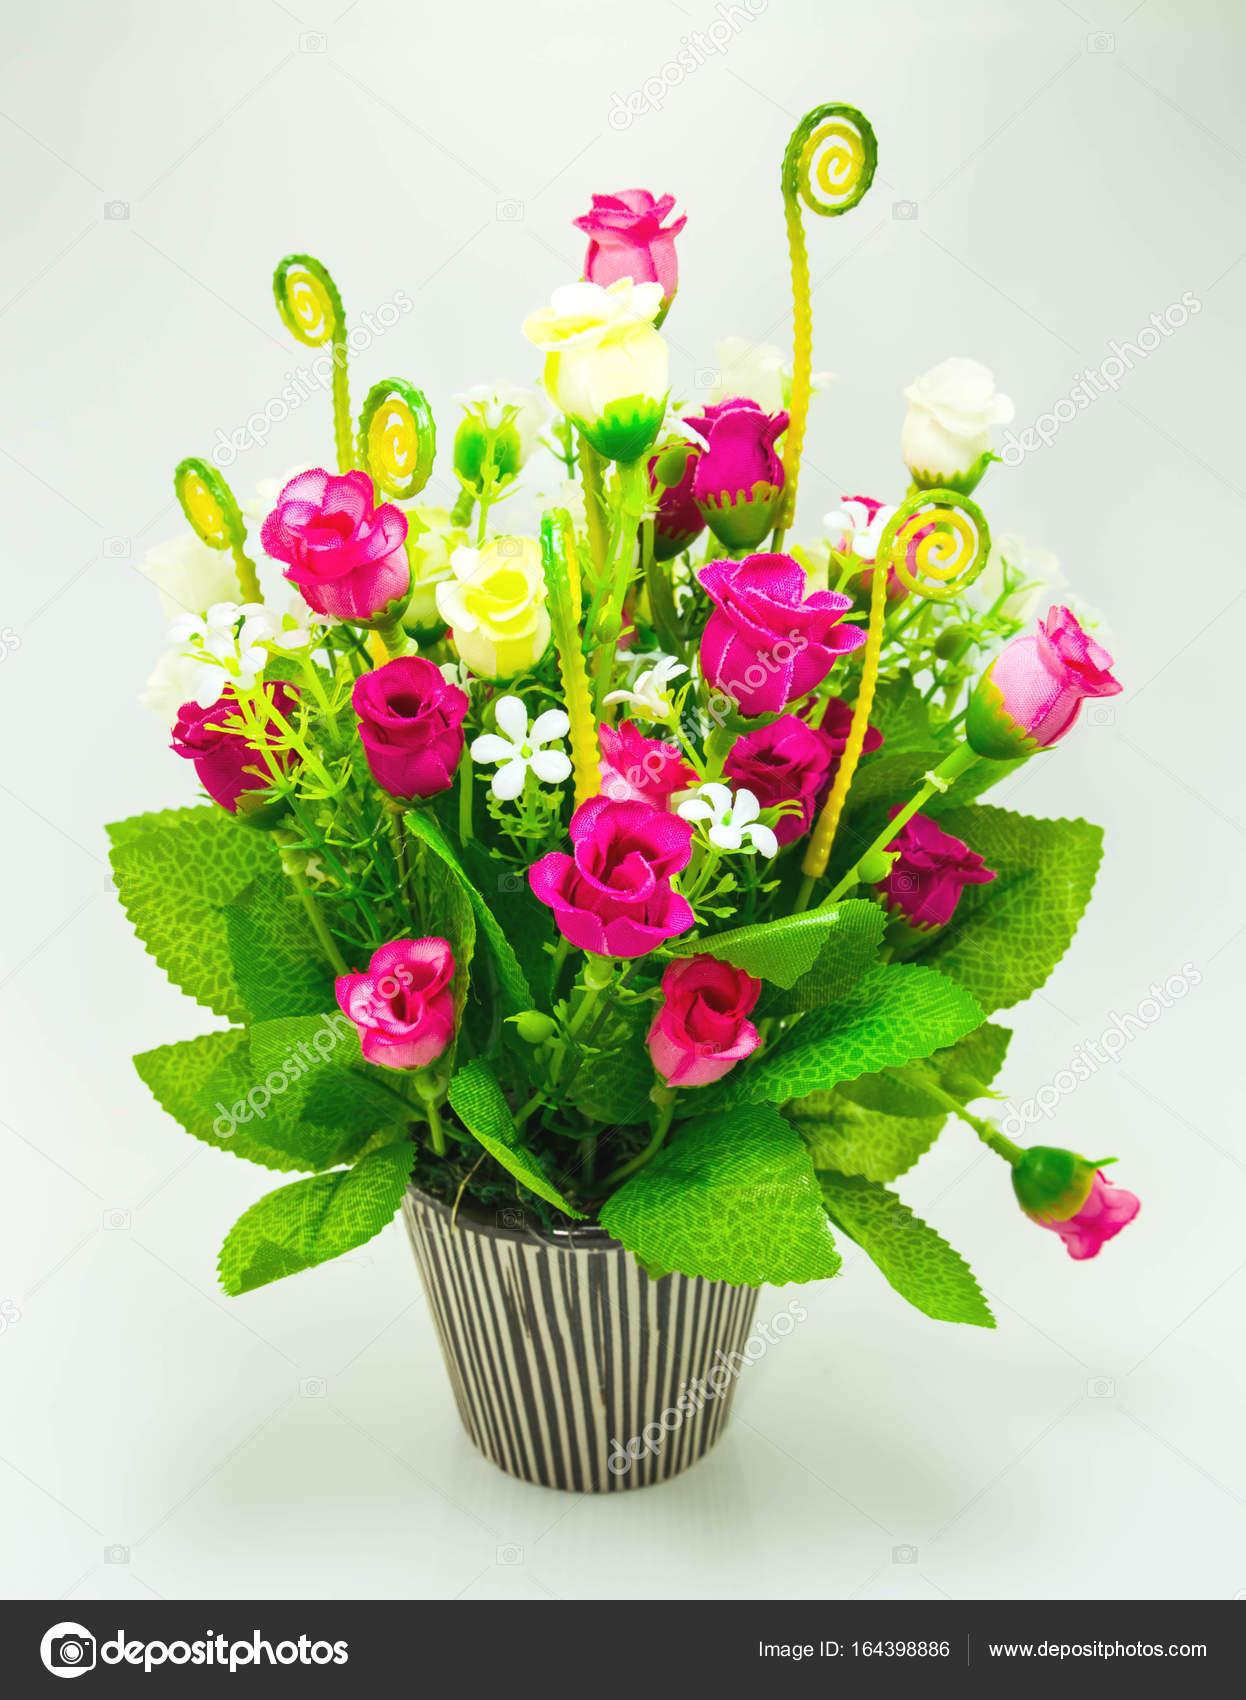 Kunstliche Blumen In Keramikvase Stockfoto C Sumintra 164398886